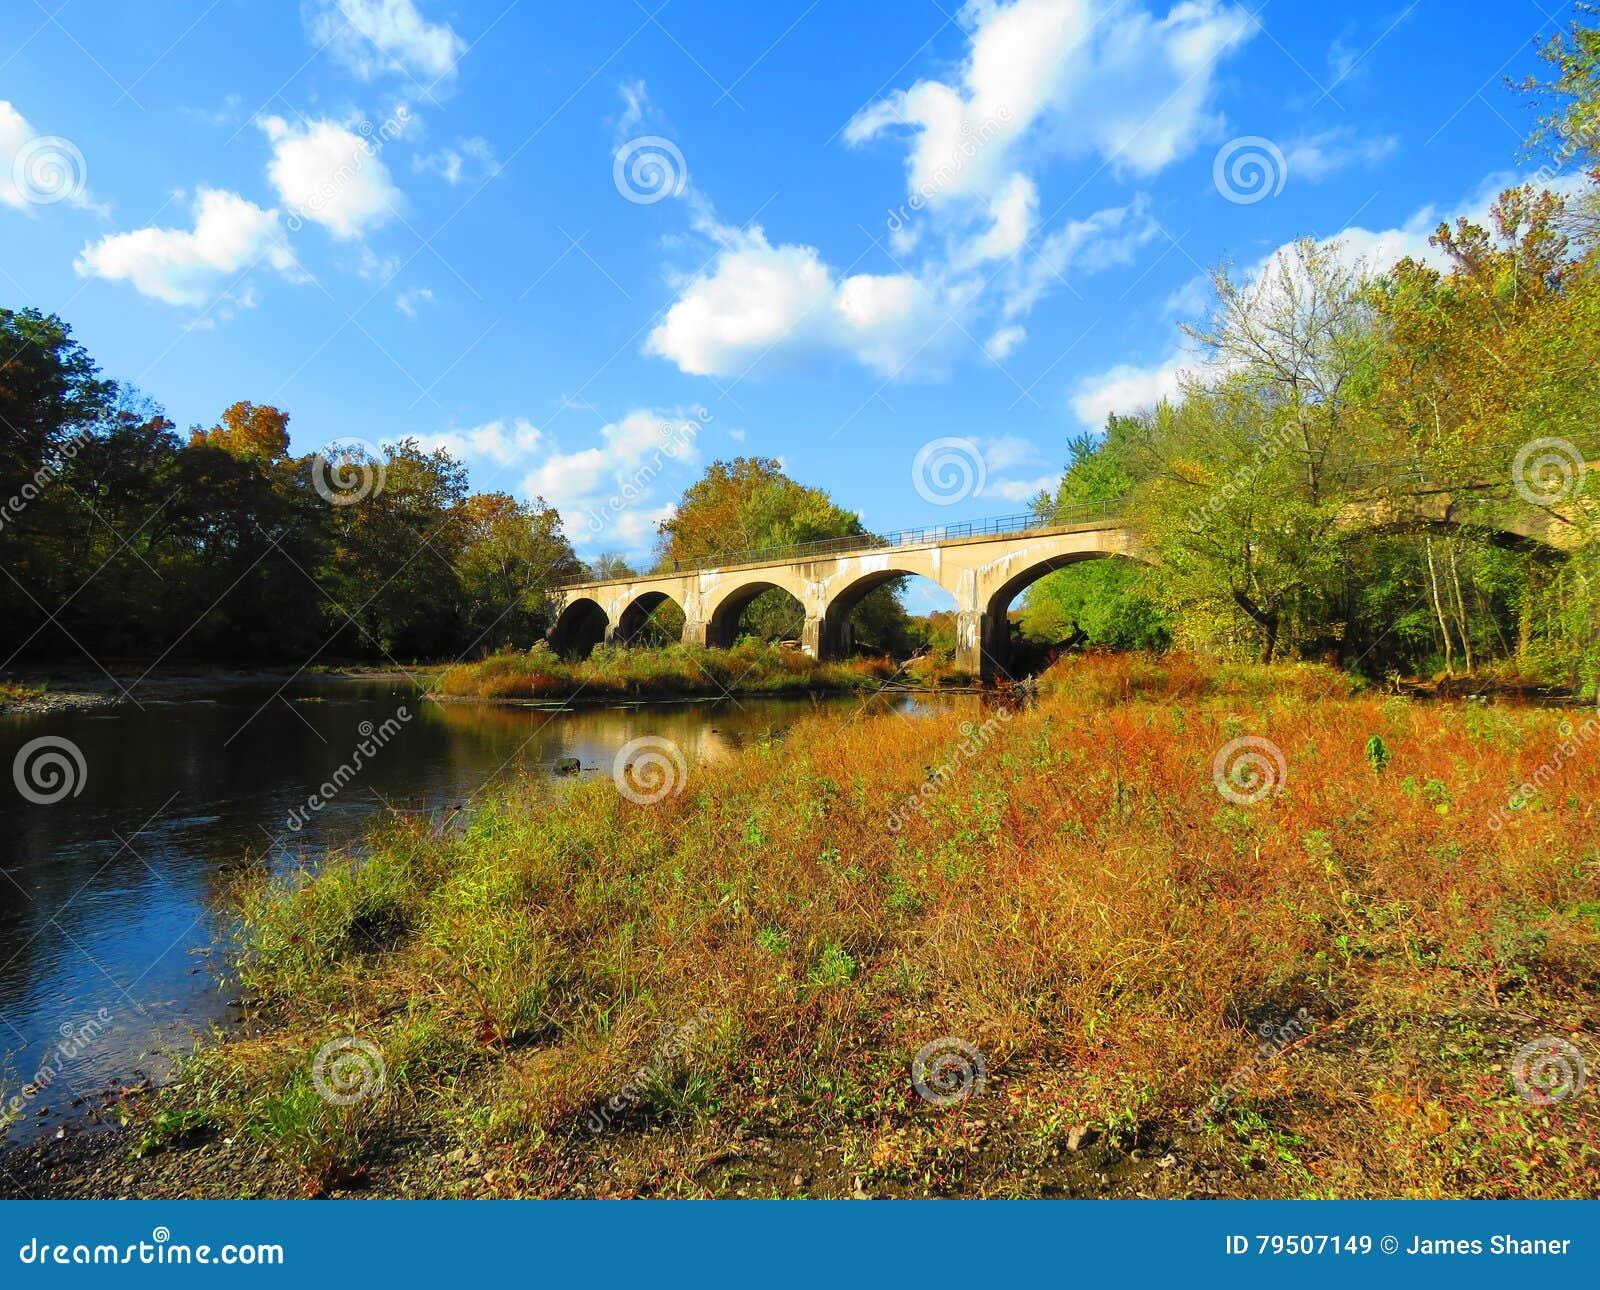 Schuylkill River Trail near Douglassville, Pennsylvania